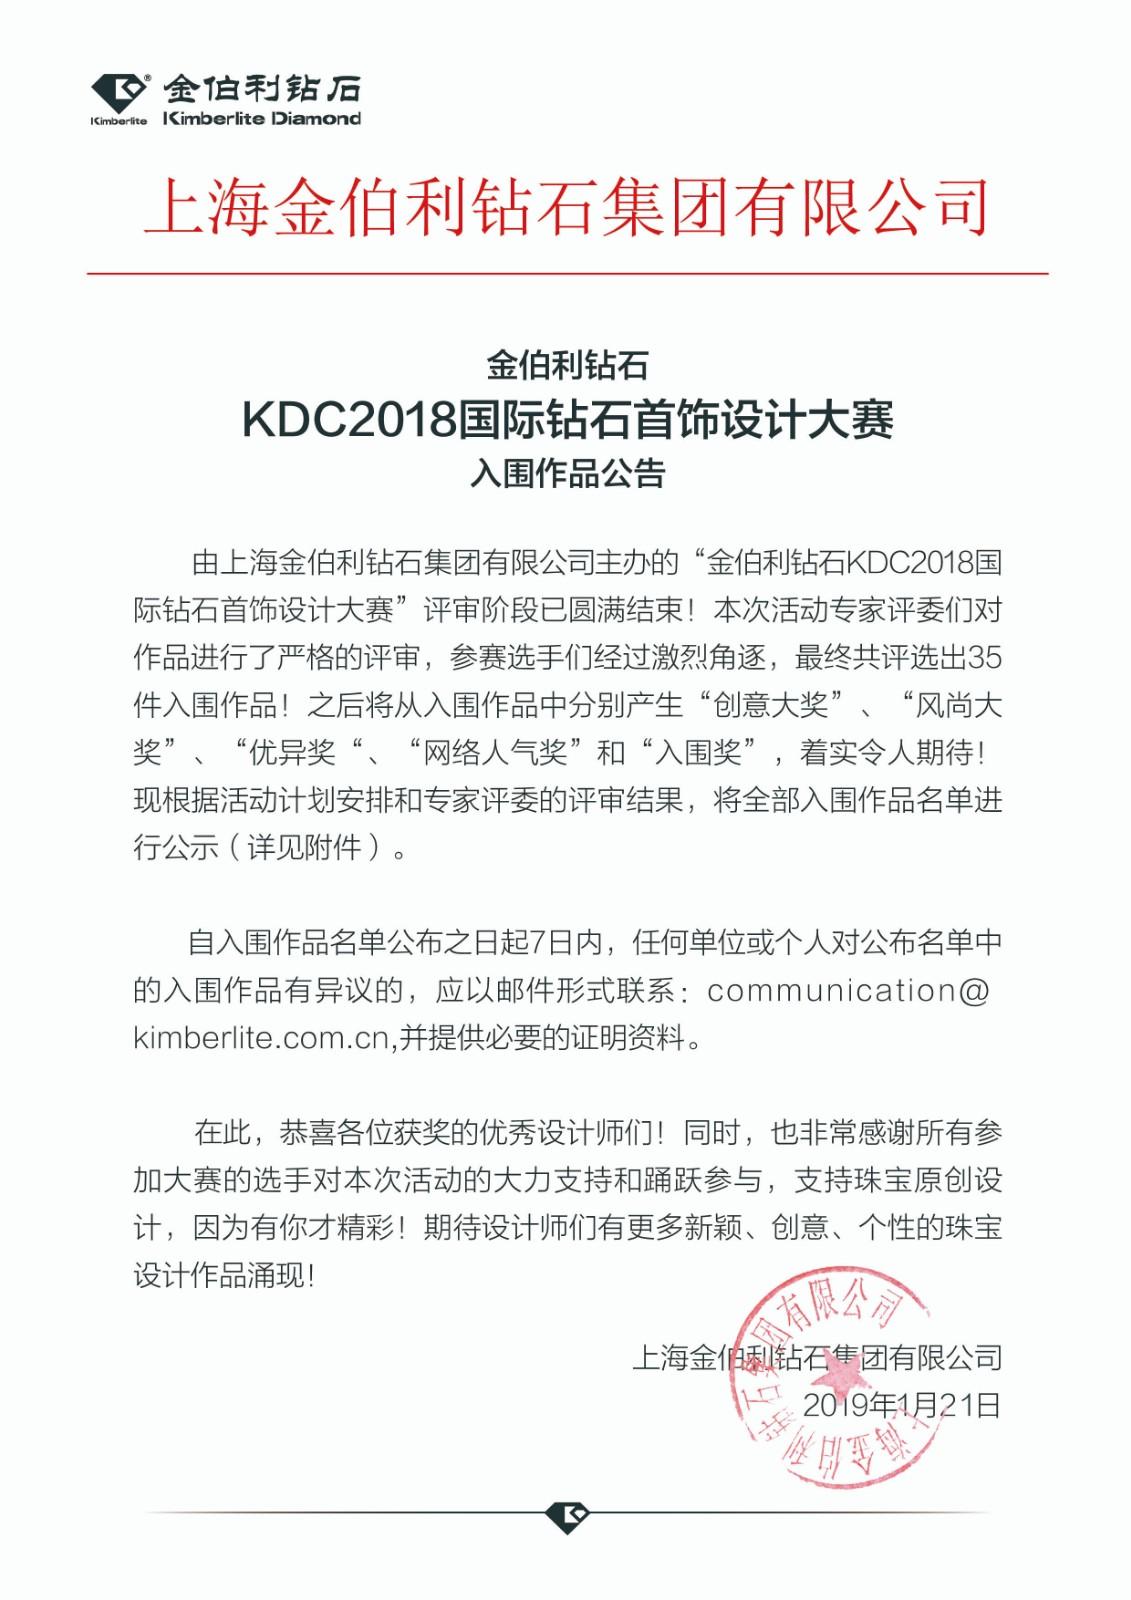 KDC2018国际钻石首饰设计大赛入围作品公告